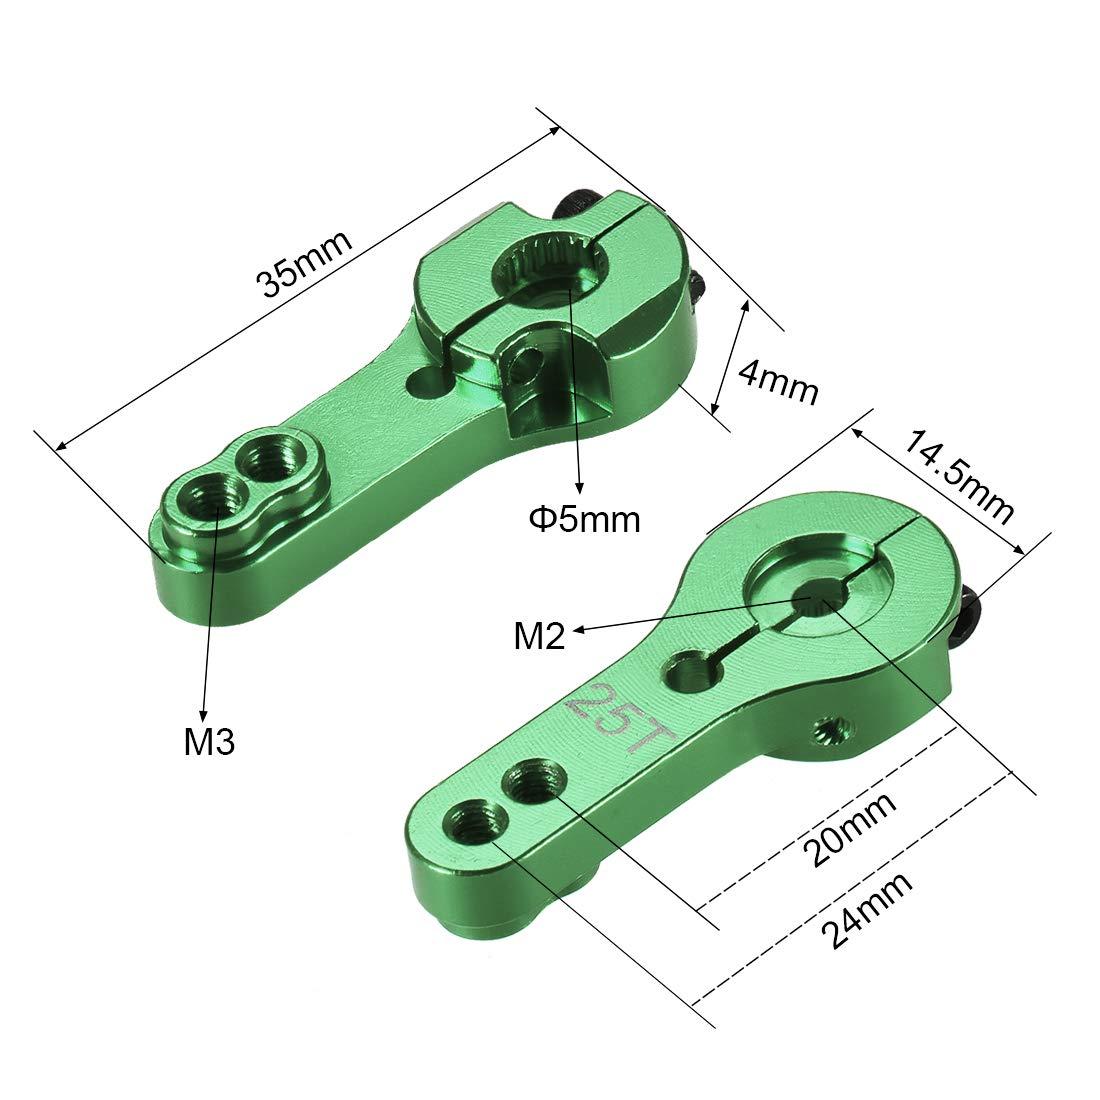 uxcell Aluminum Servo Horn 25T M3 Thread Green for Futaba Savox Xcore HL HSP HD Power Go Tech,5pcs